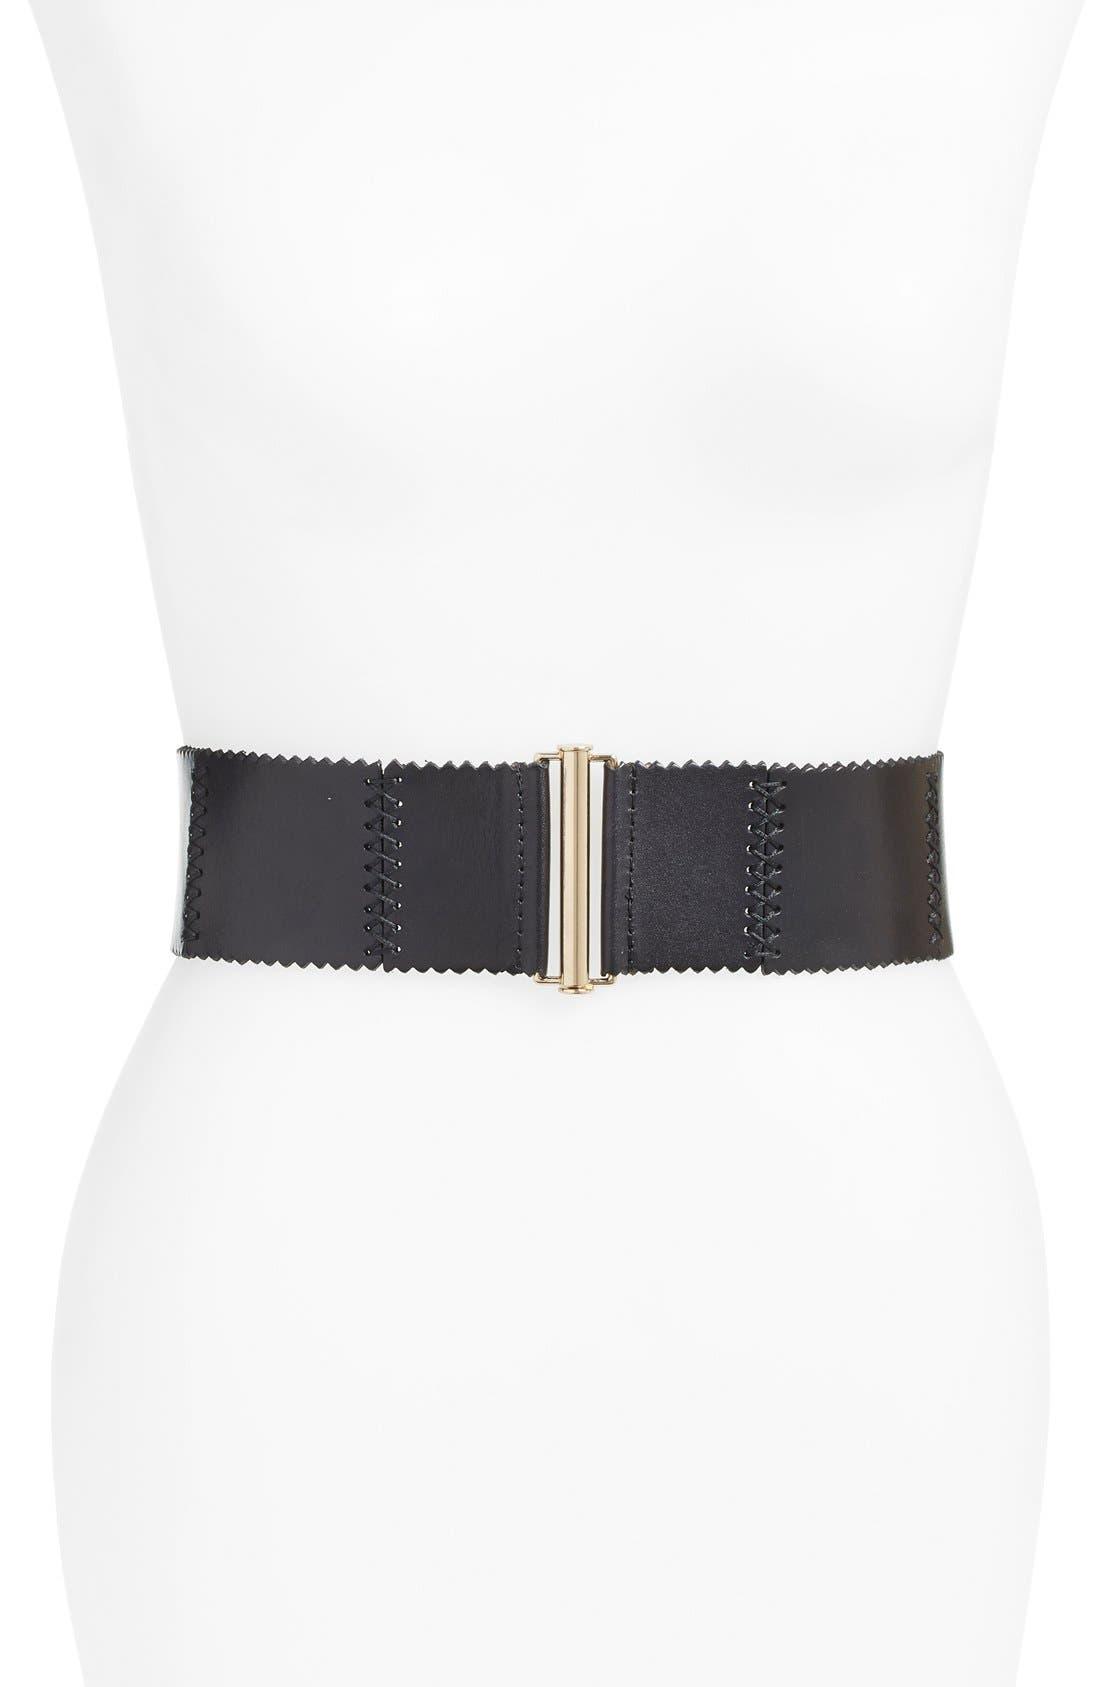 'Woodland' Stitched Leather Belt,                         Main,                         color, BLACK